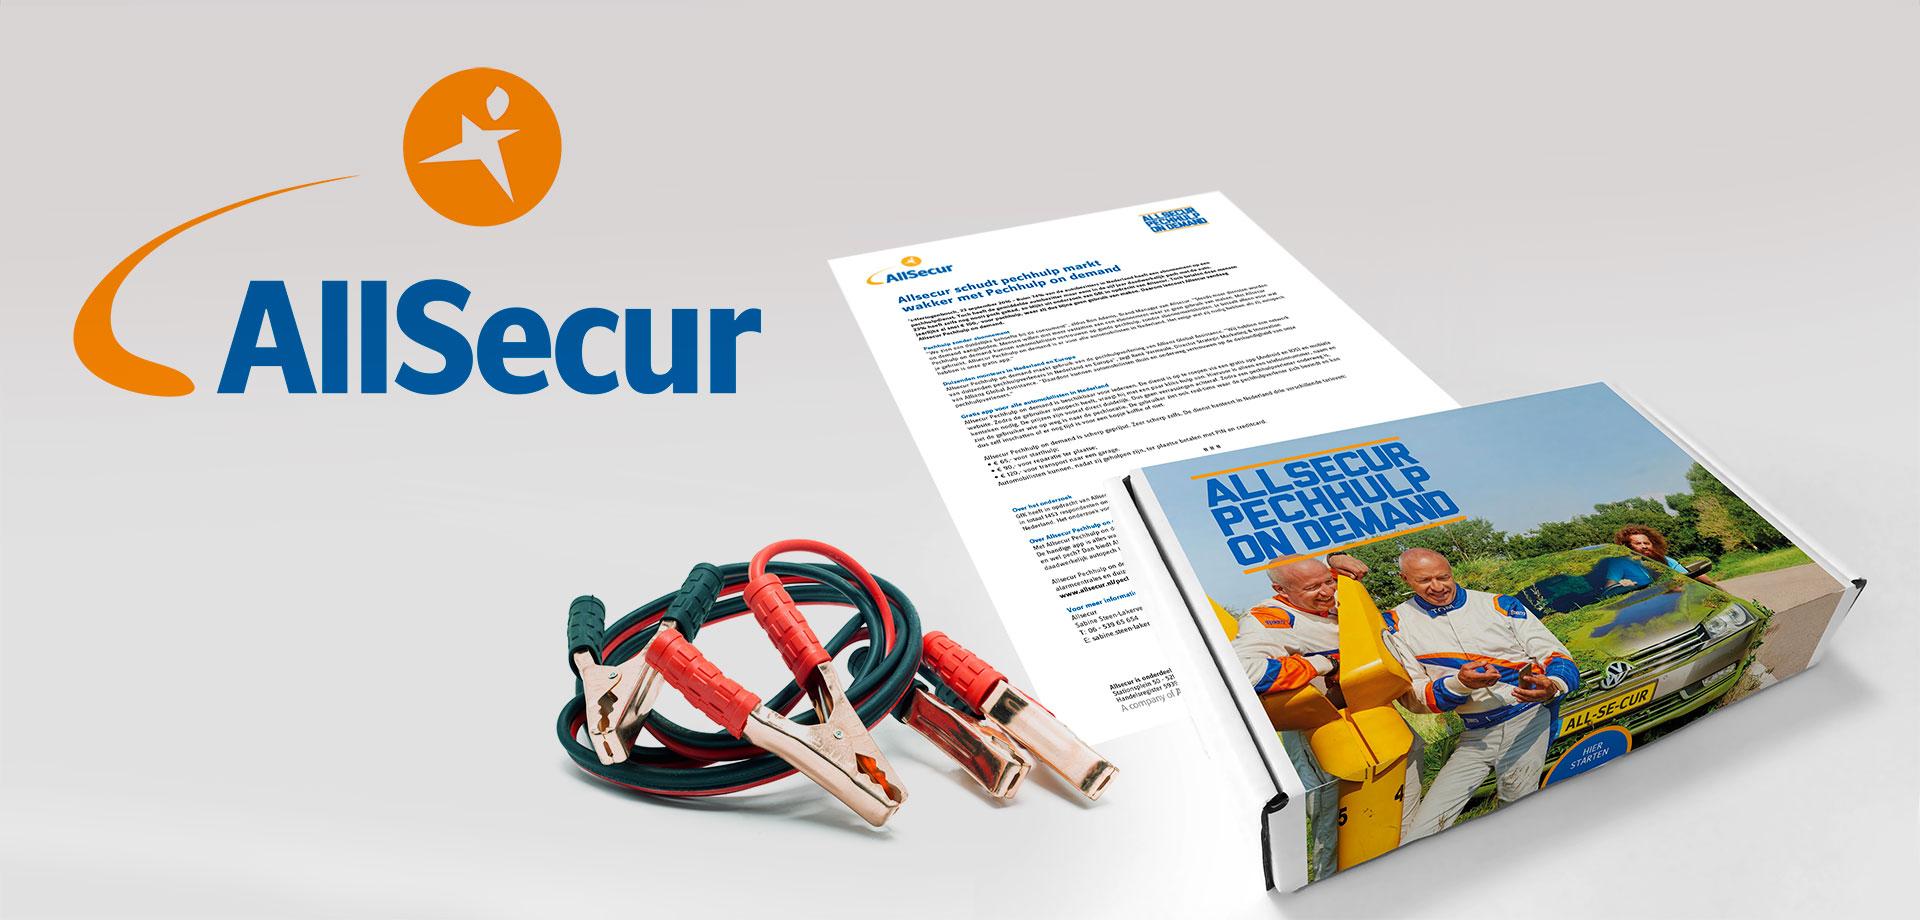 Direct mailing pechhulp on demand - Allsecur